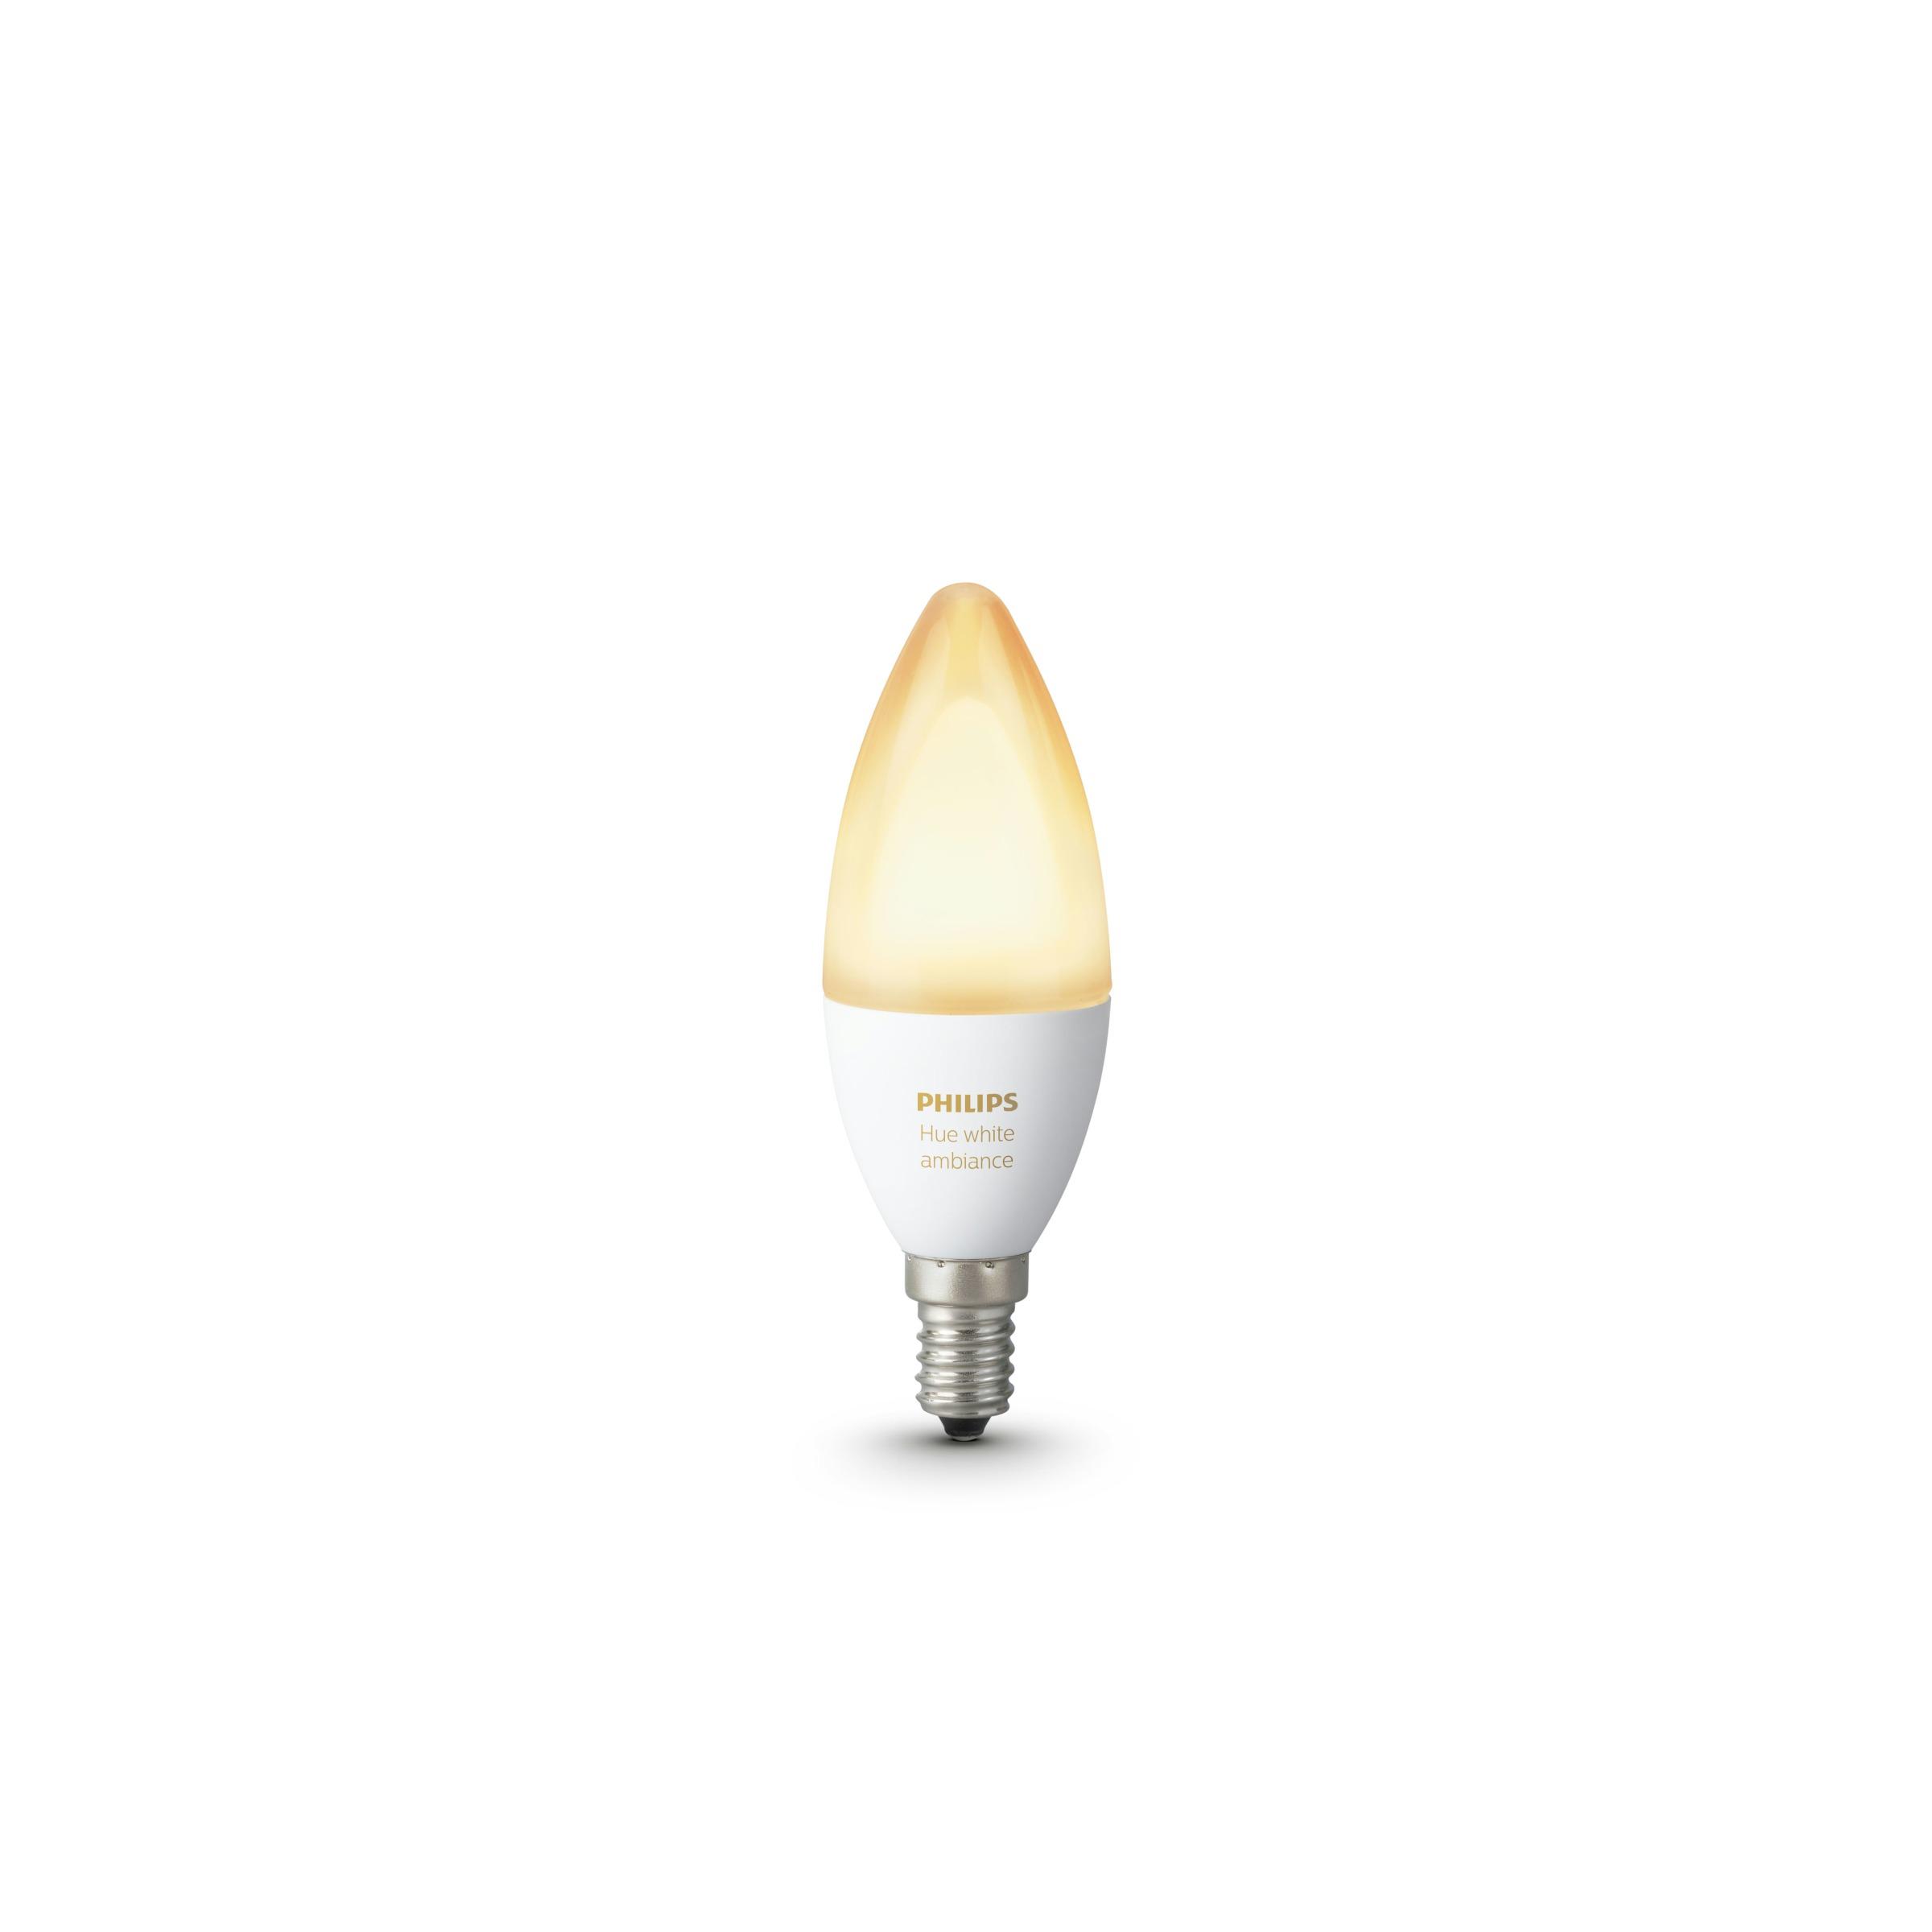 Philips Hue Single Bulb E14 White Ambiance